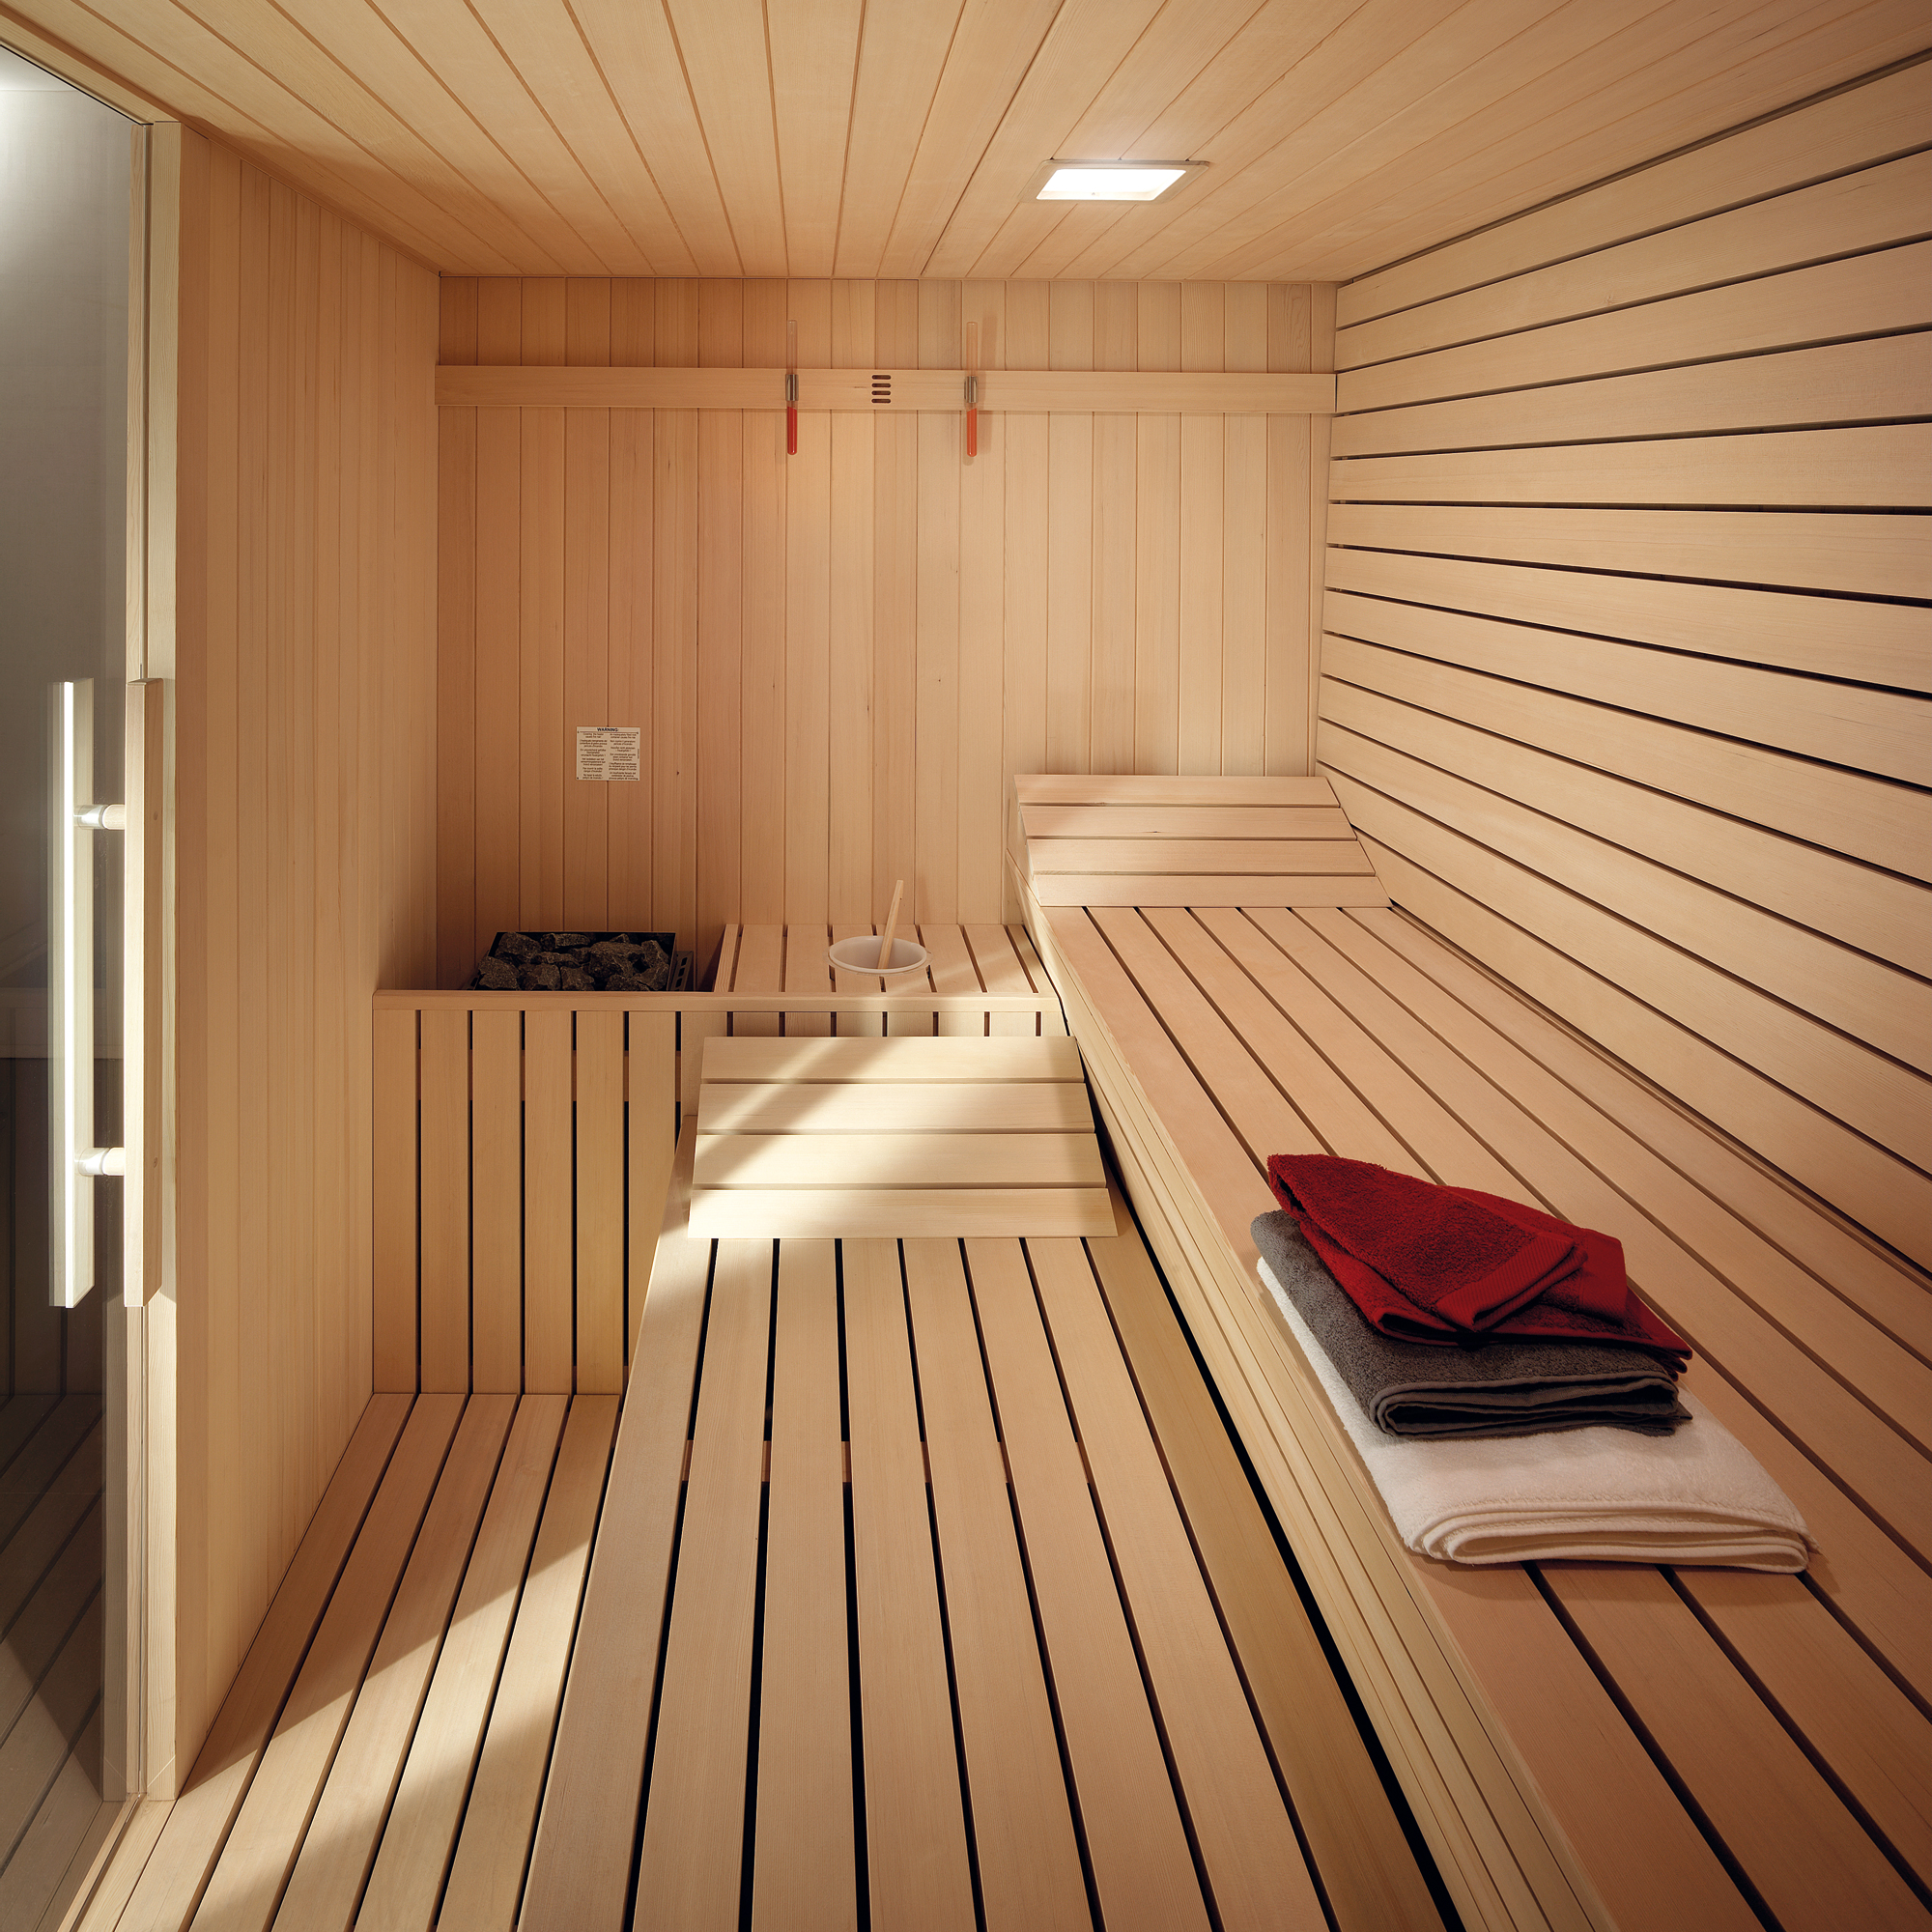 Sauna gym effegibi - Que es una sauna ...